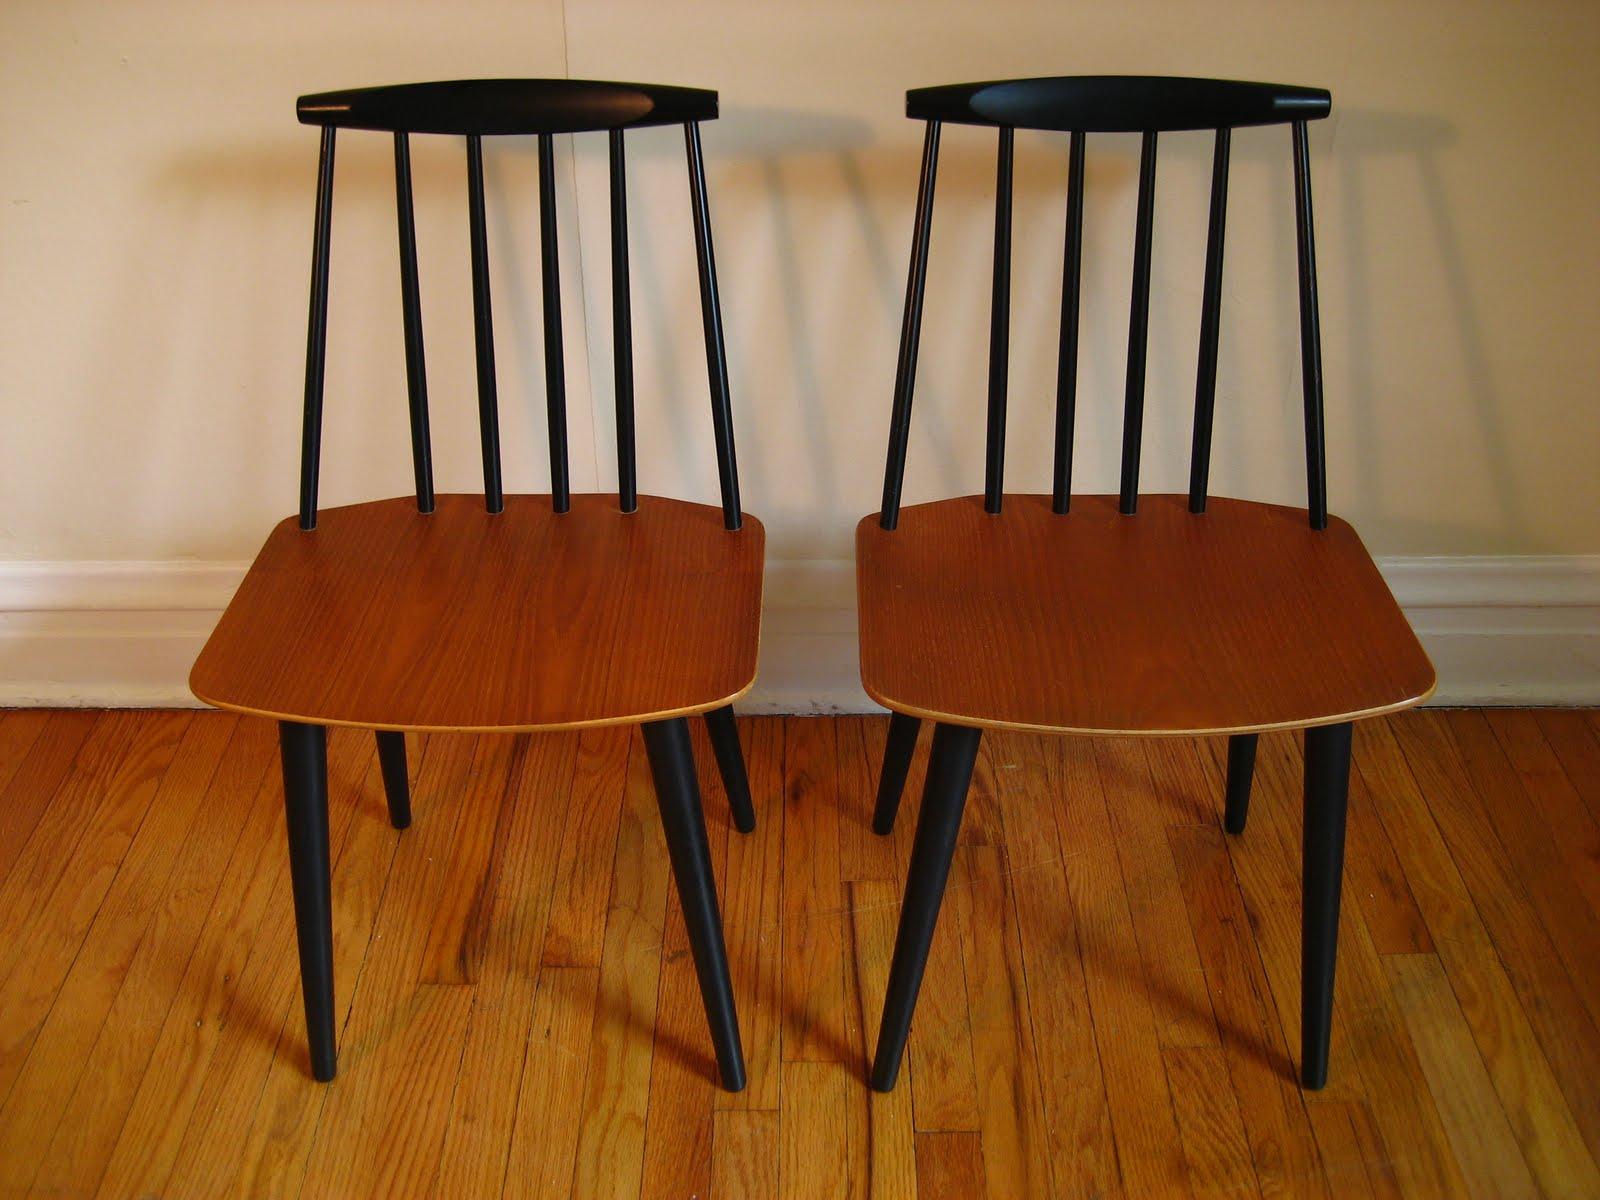 Flatout design: Folke Palsson Chairs